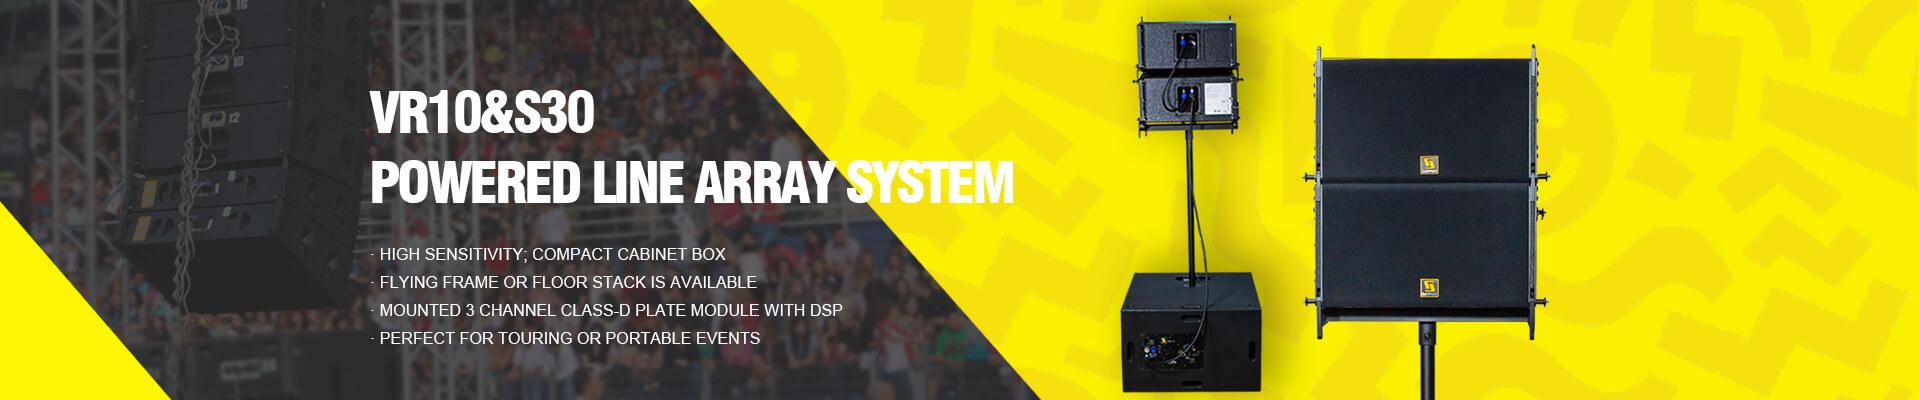 powered line array speaker